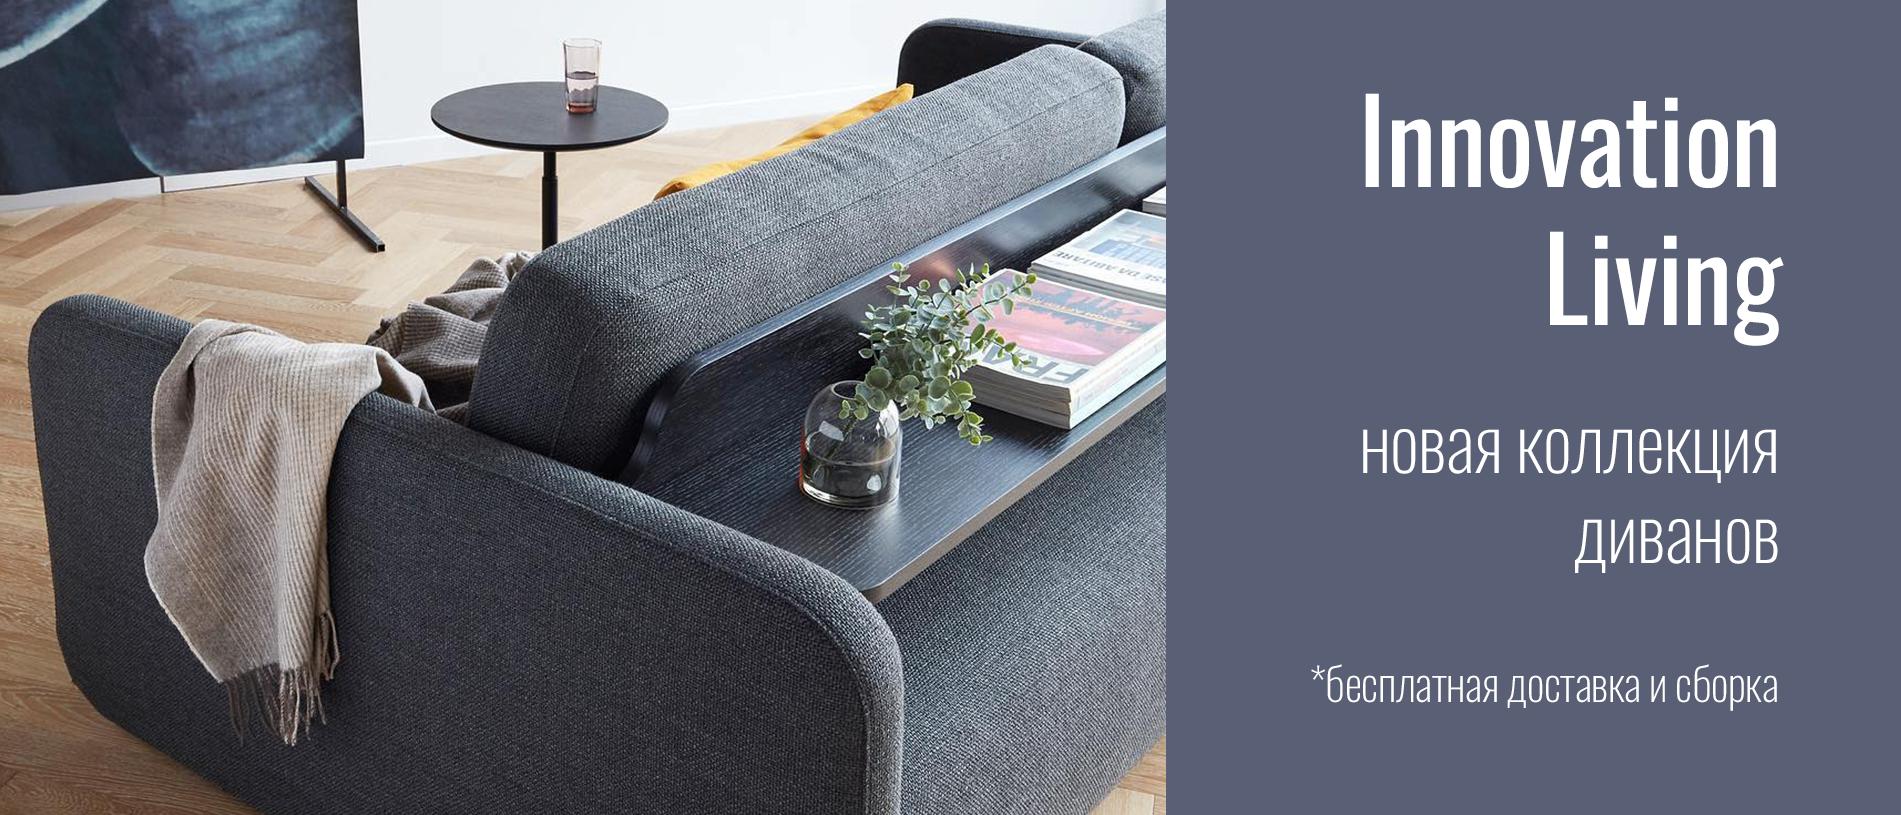 MR Slider Sofa – Right 02